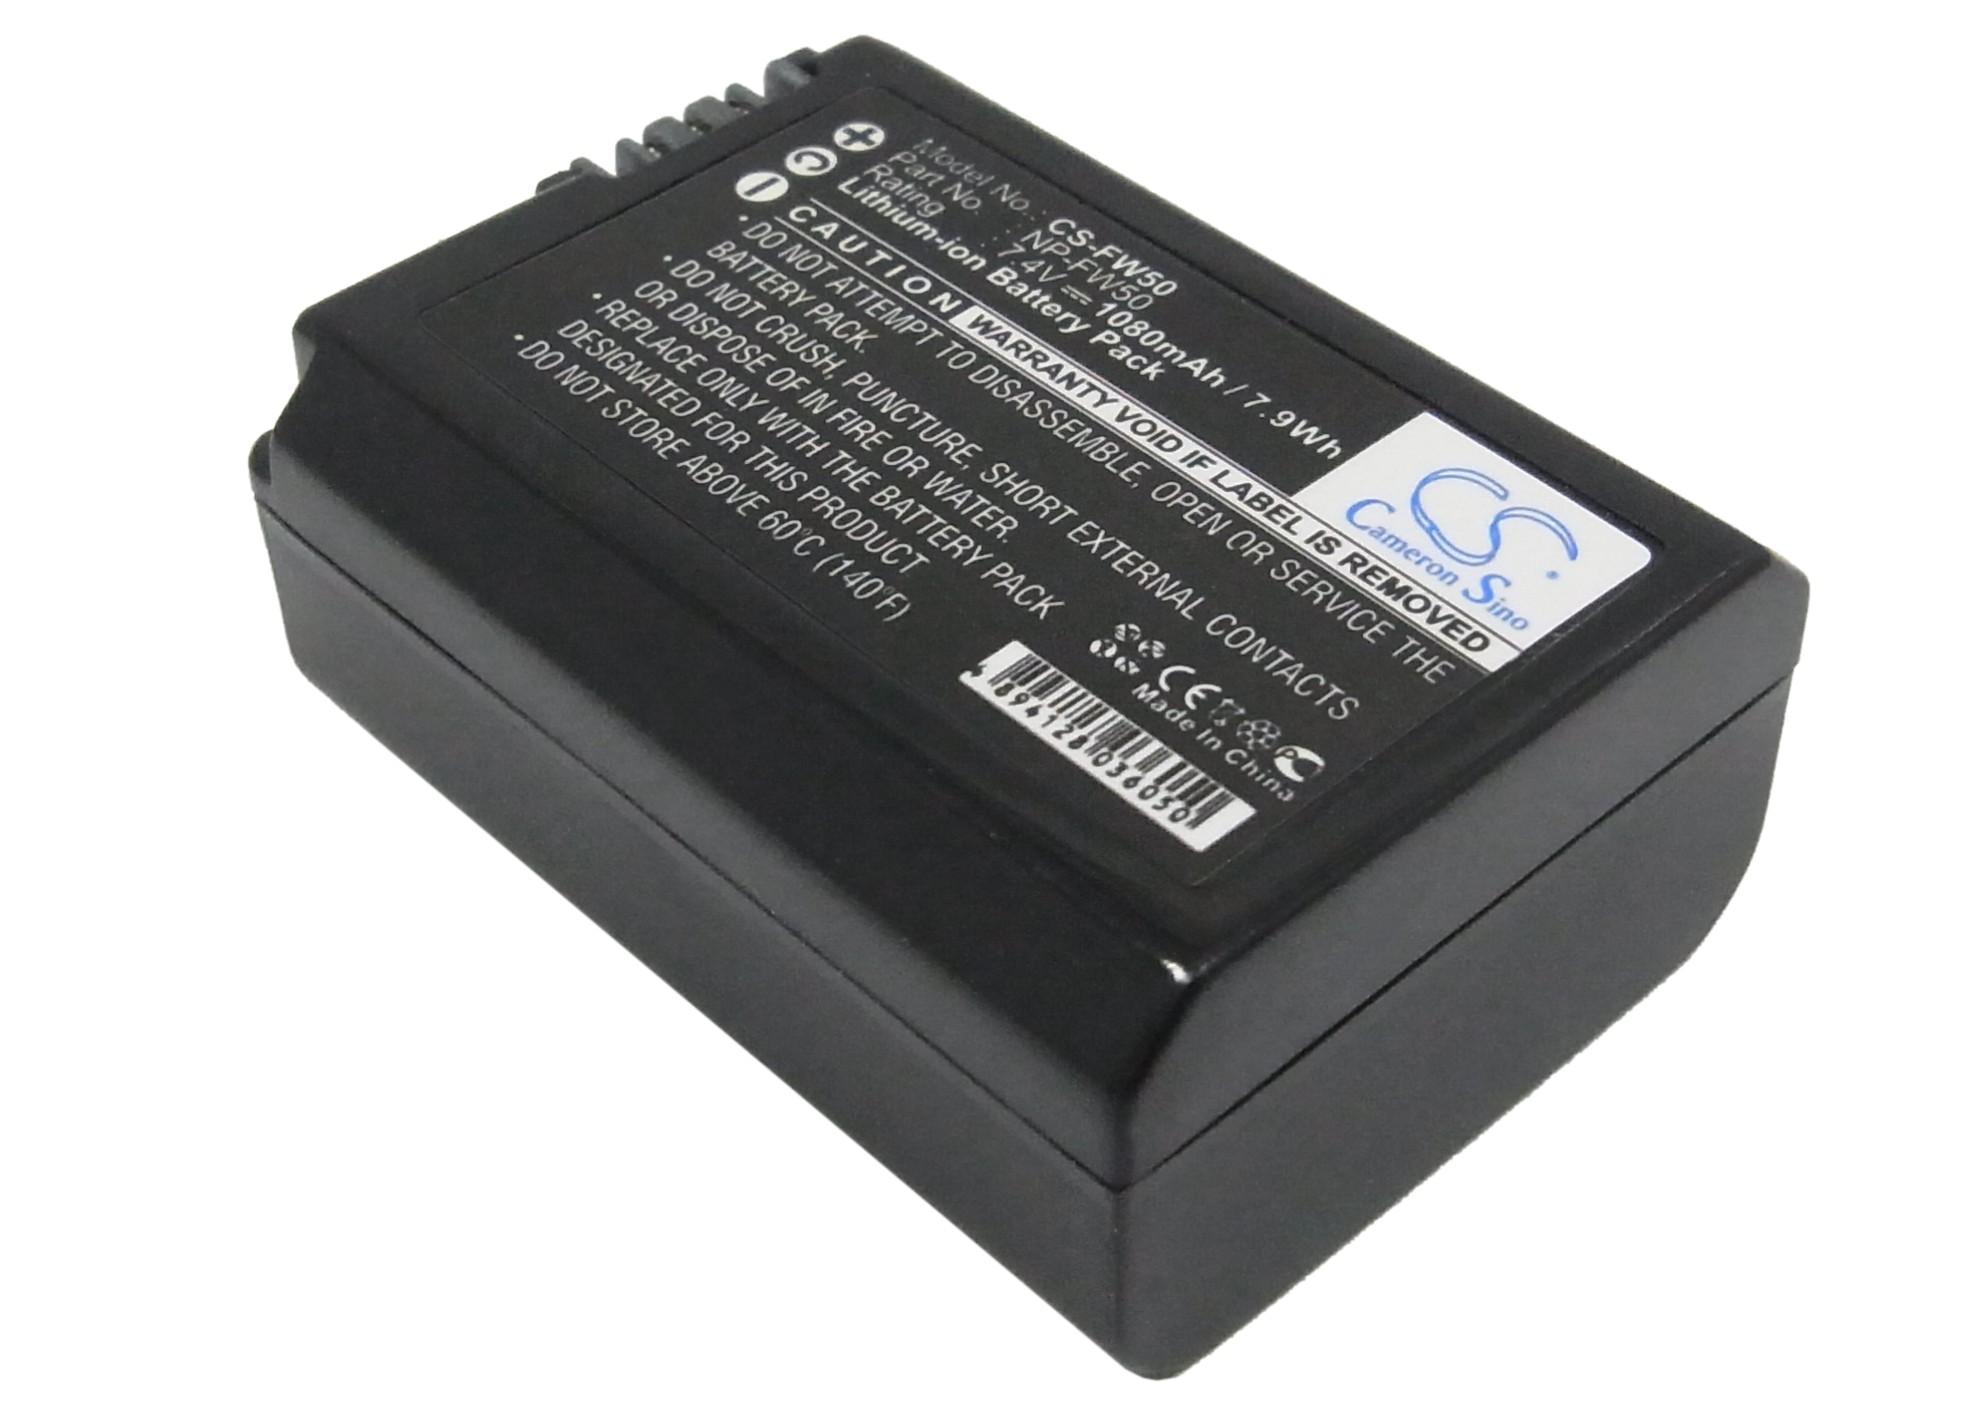 Cameron Sino baterie do kamer a fotoaparátů pro SONY NEX-5N 7.4V Li-ion 1080mAh černá - neoriginální